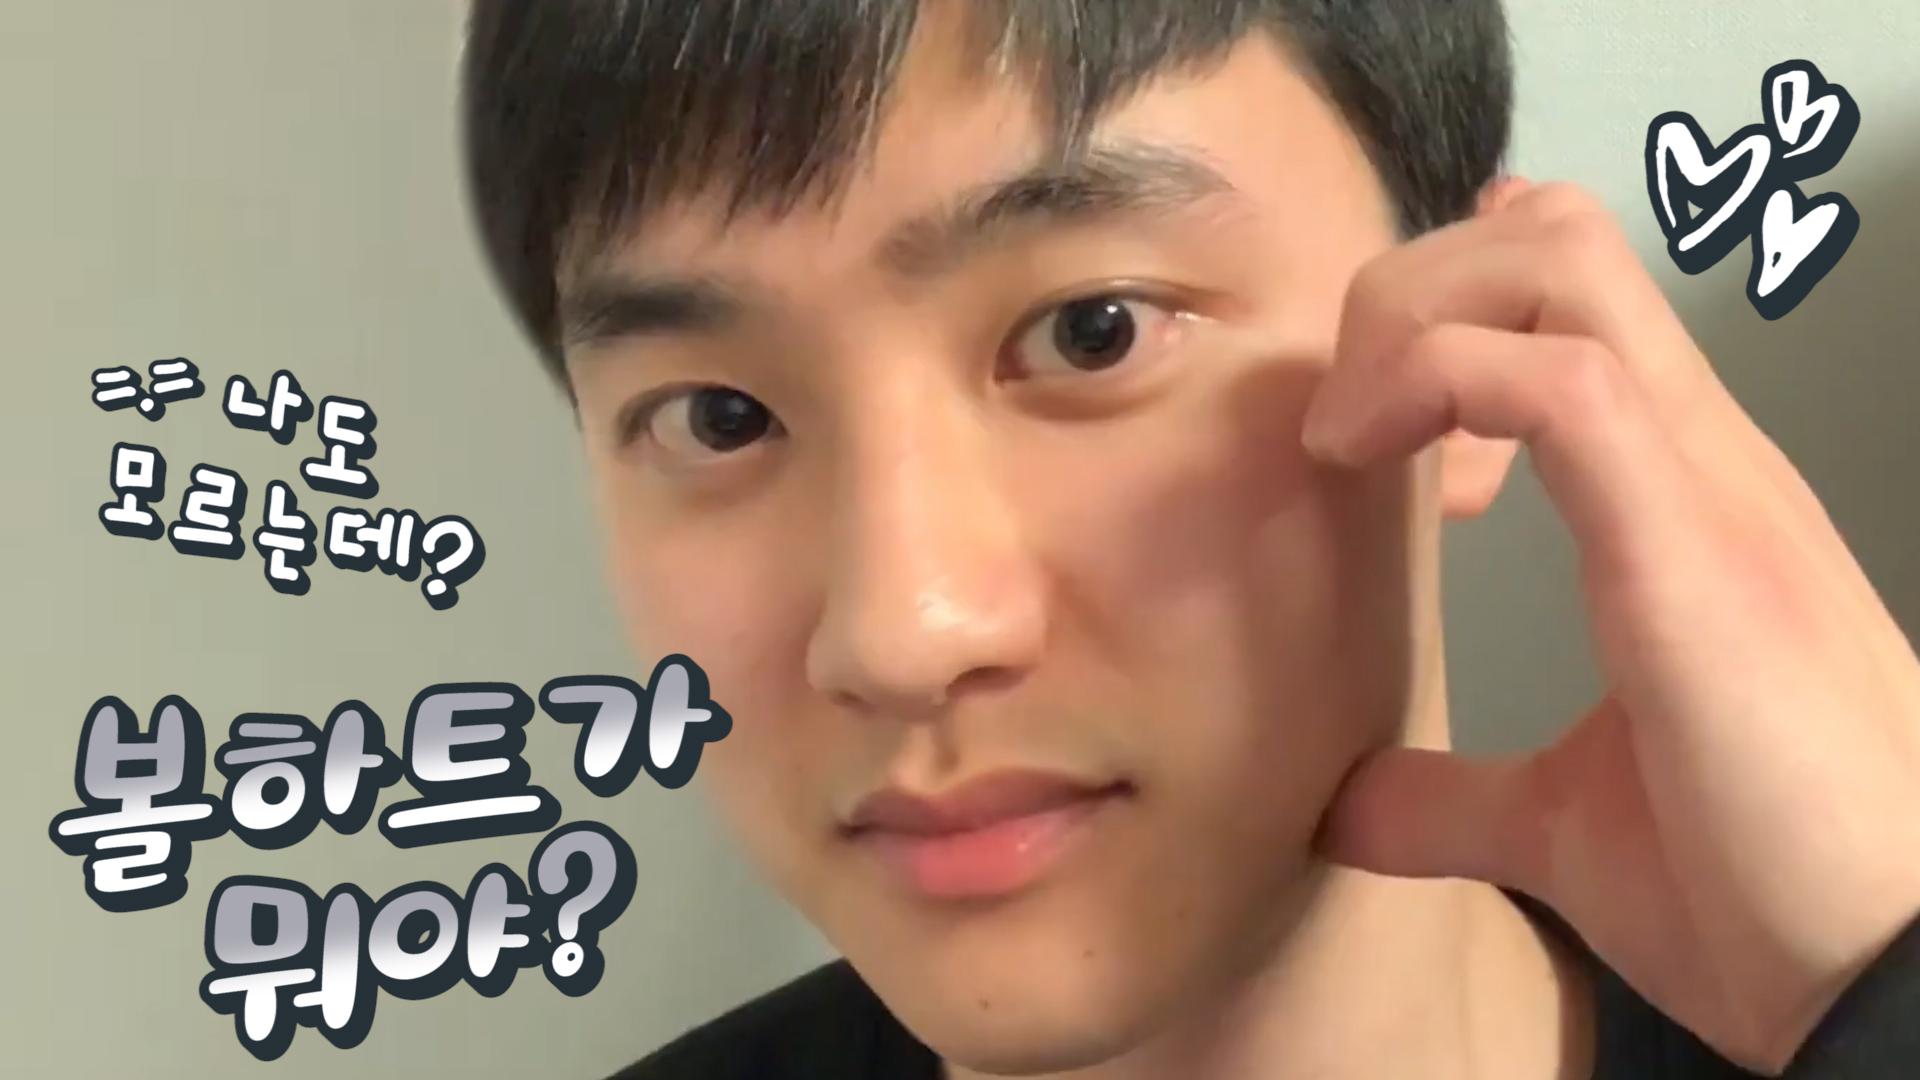 [EXO] 셀 수 없는 밤과 별을 지나💫 됴냥이를 보는 그 날입니다💗 (WELCOME BACK D.O.!)